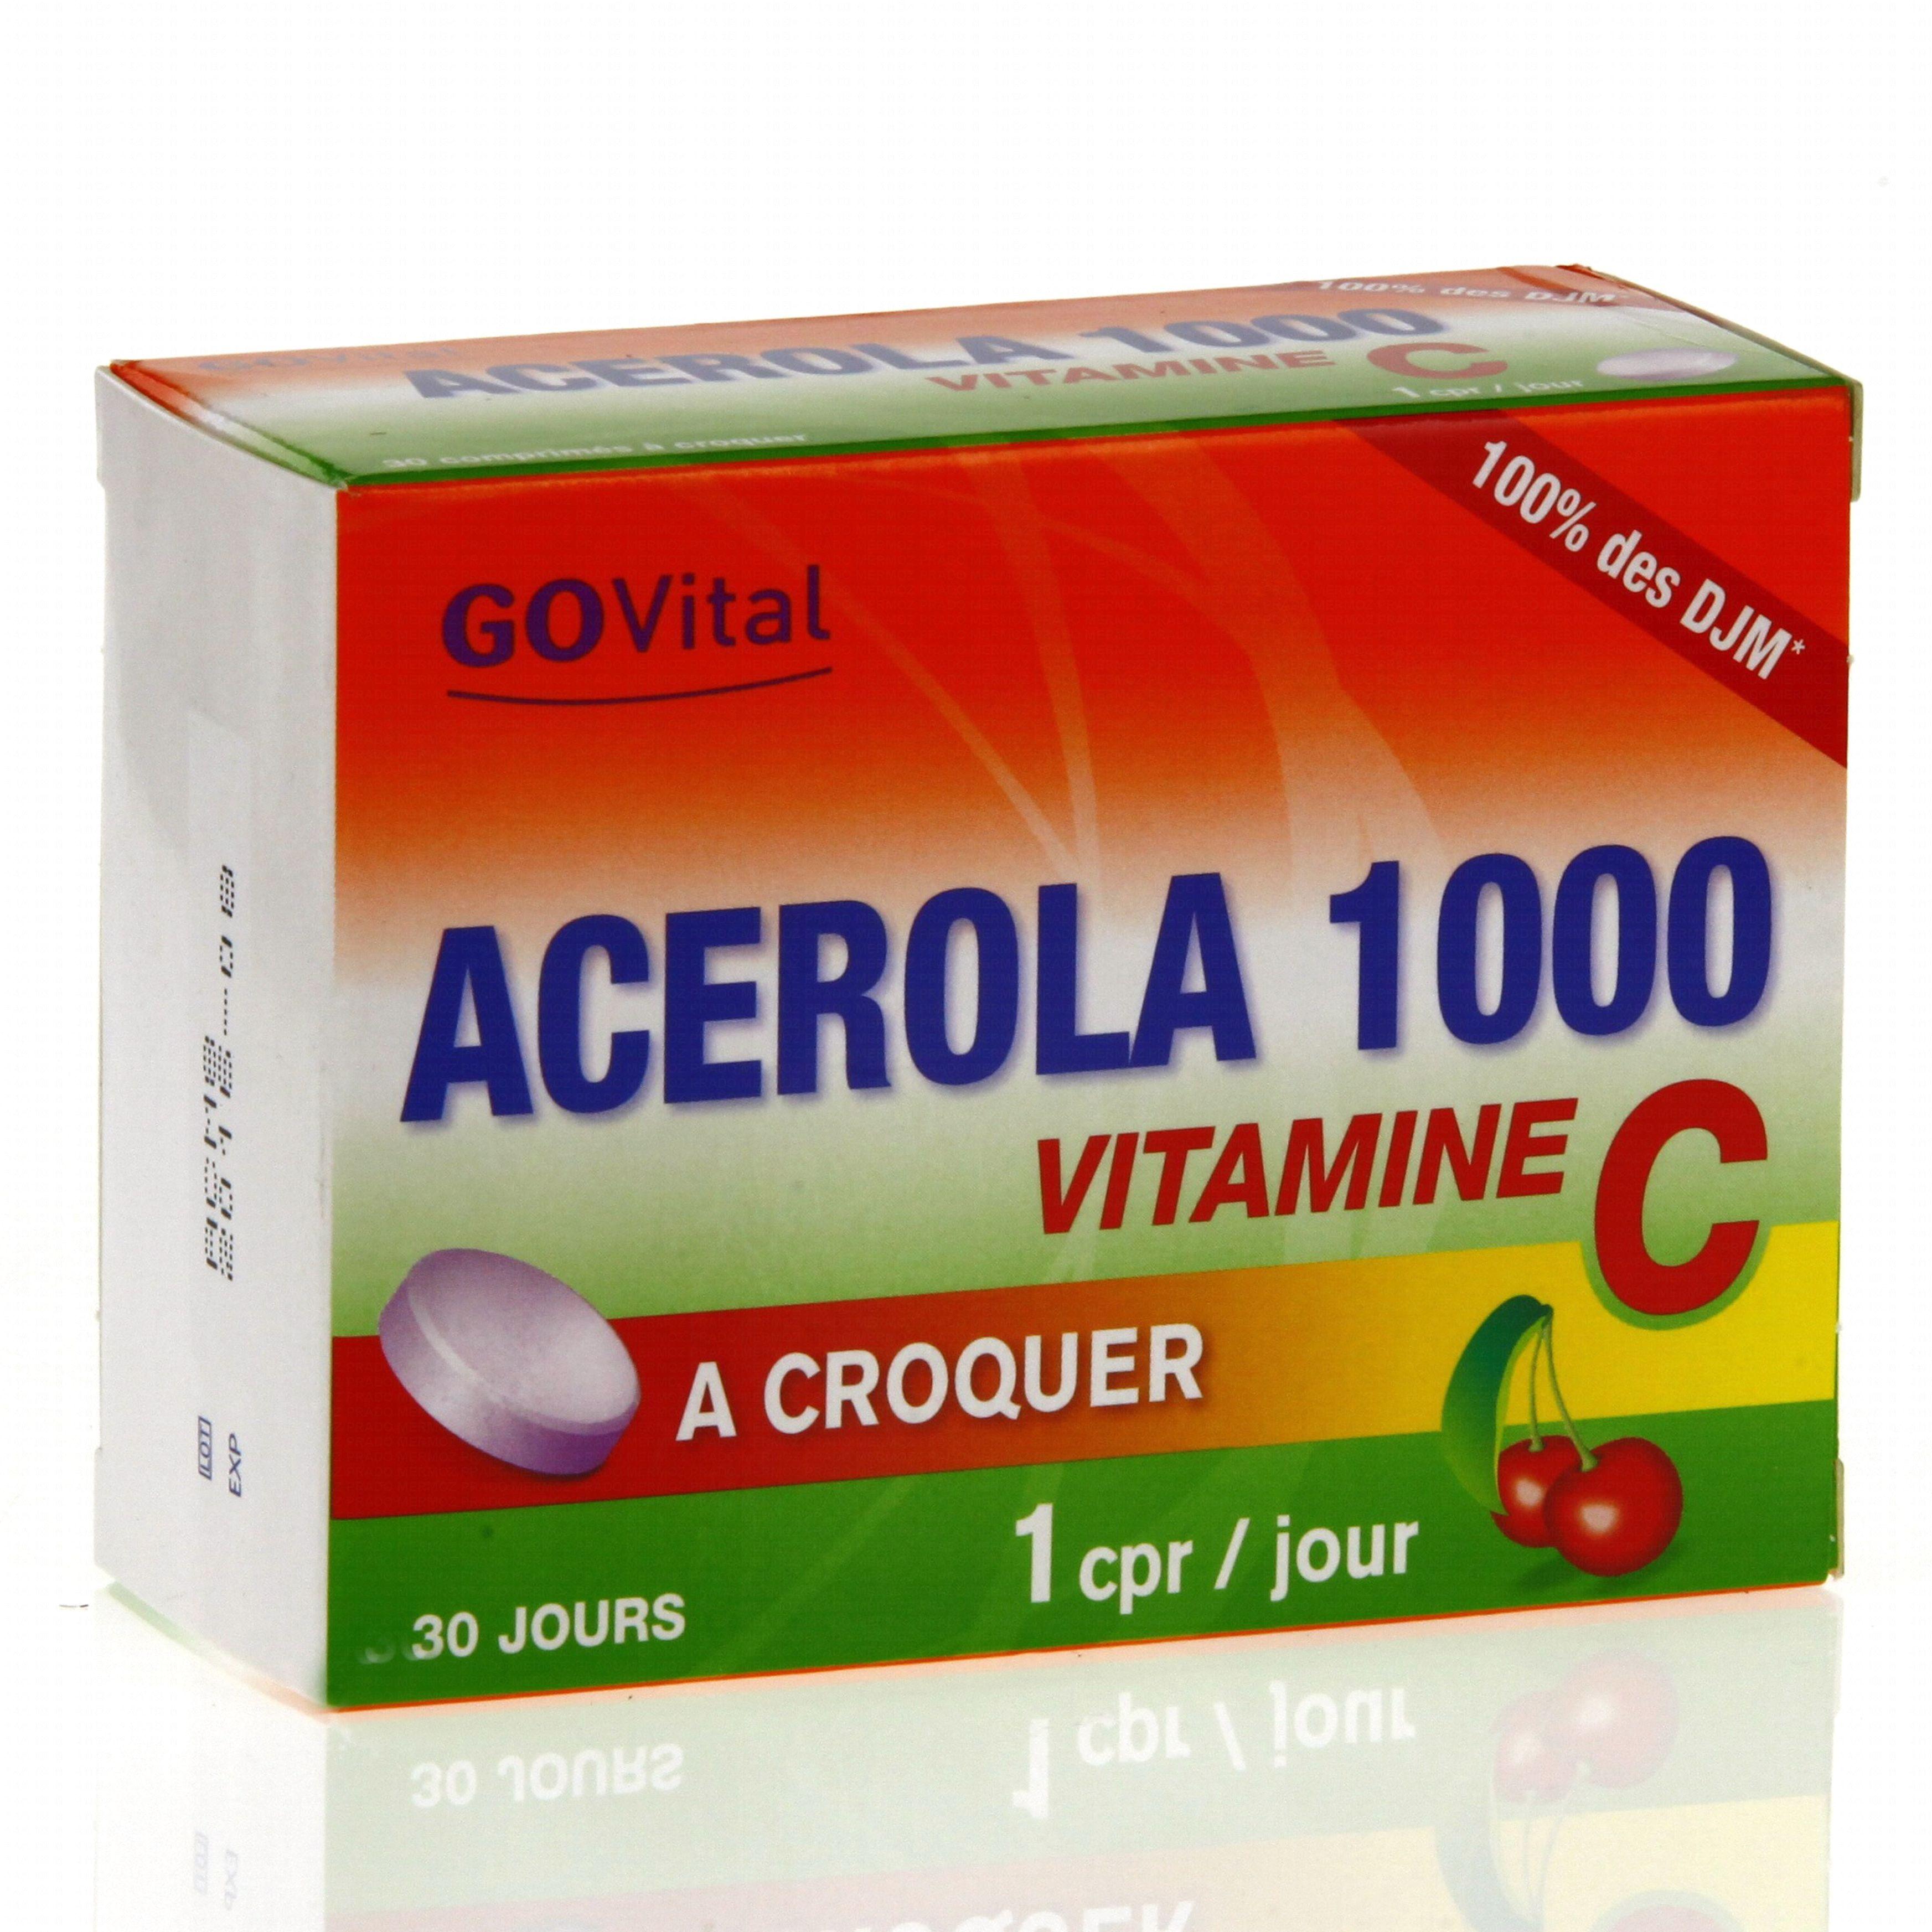 Acerola Govital